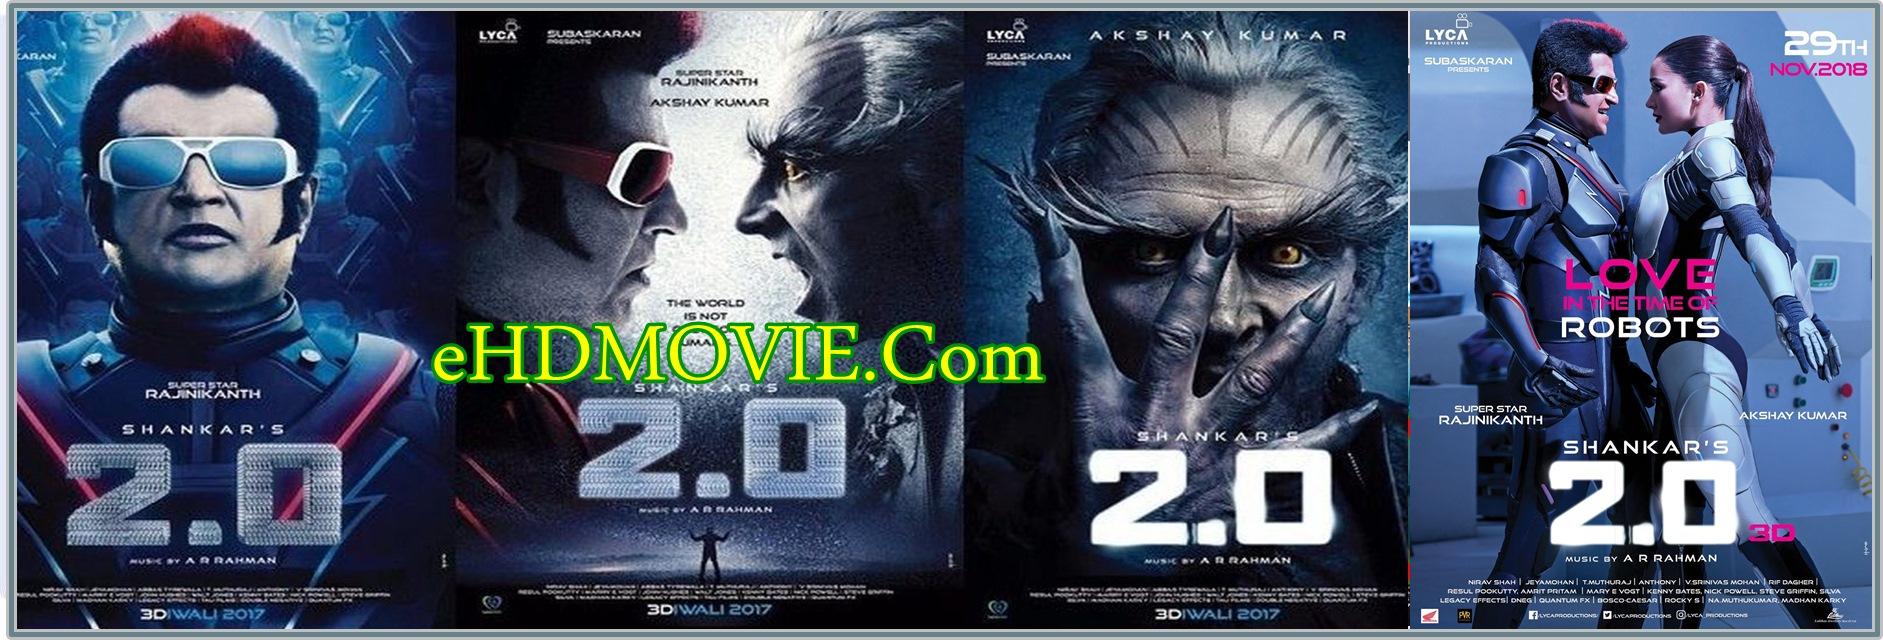 2.0 2018 Full Movie Hindi 1080p - 720p - HEVC - 480p ORG Pre-DvD 450MB - 800MB - 1.5GB - 2.4GB ESubs Free Download